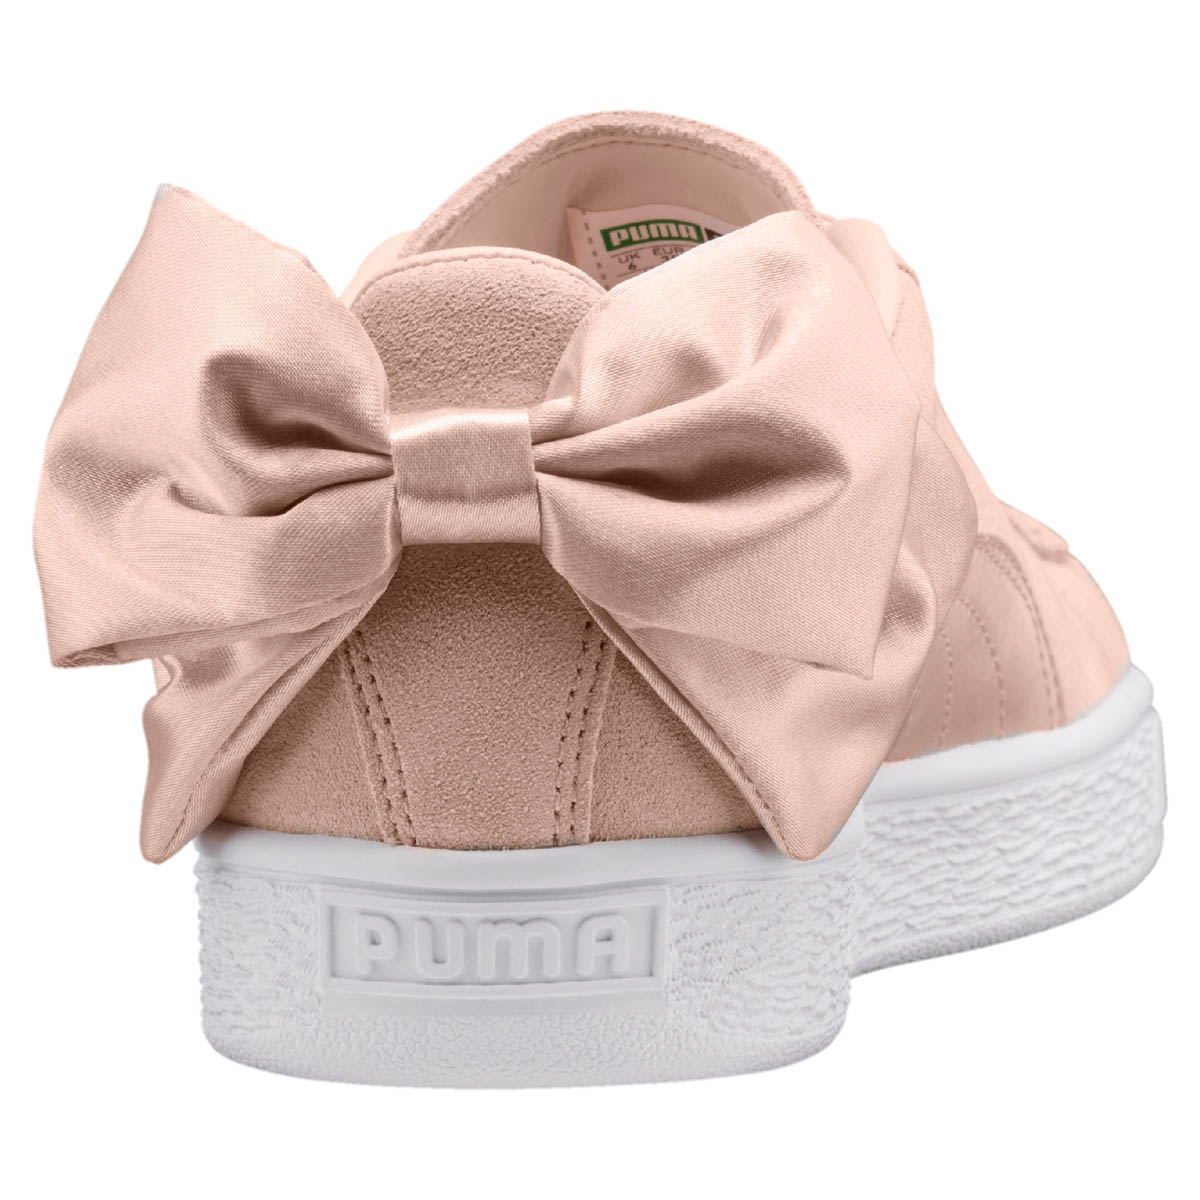 Puma Suede Bow Valentine